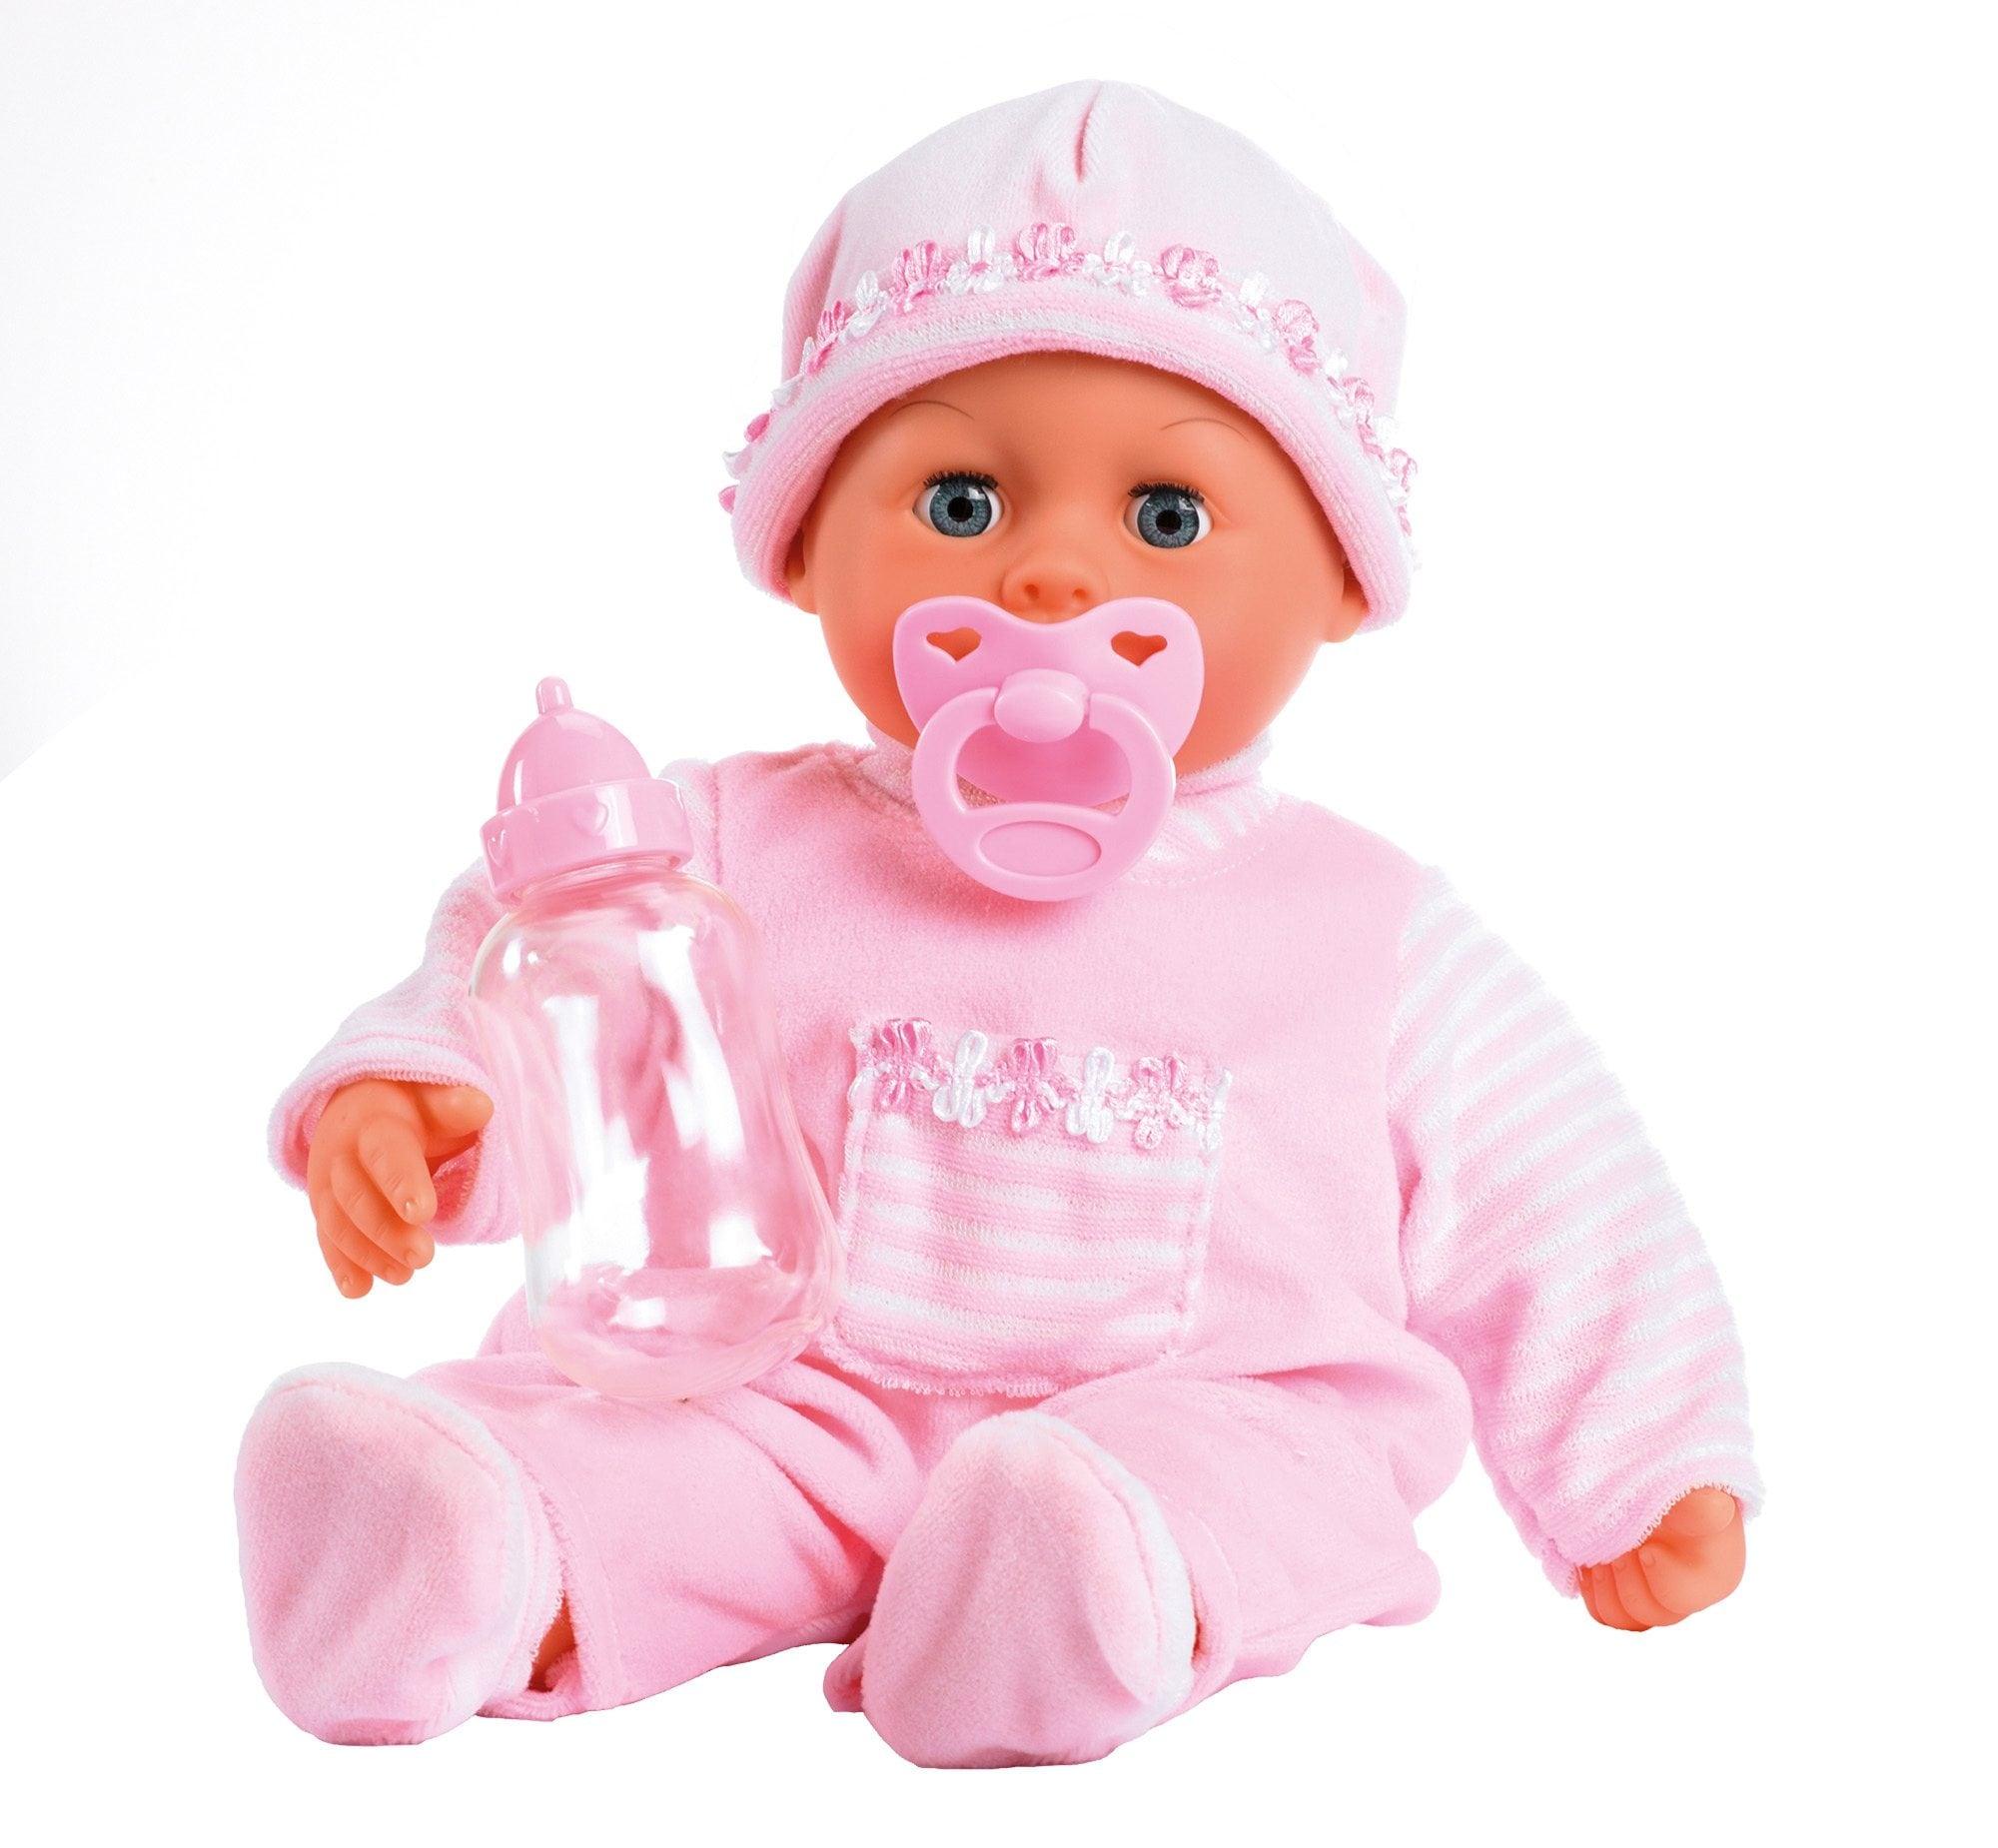 Bayer Babypuppe First Words, rosa Kinder Babypuppen Puppen